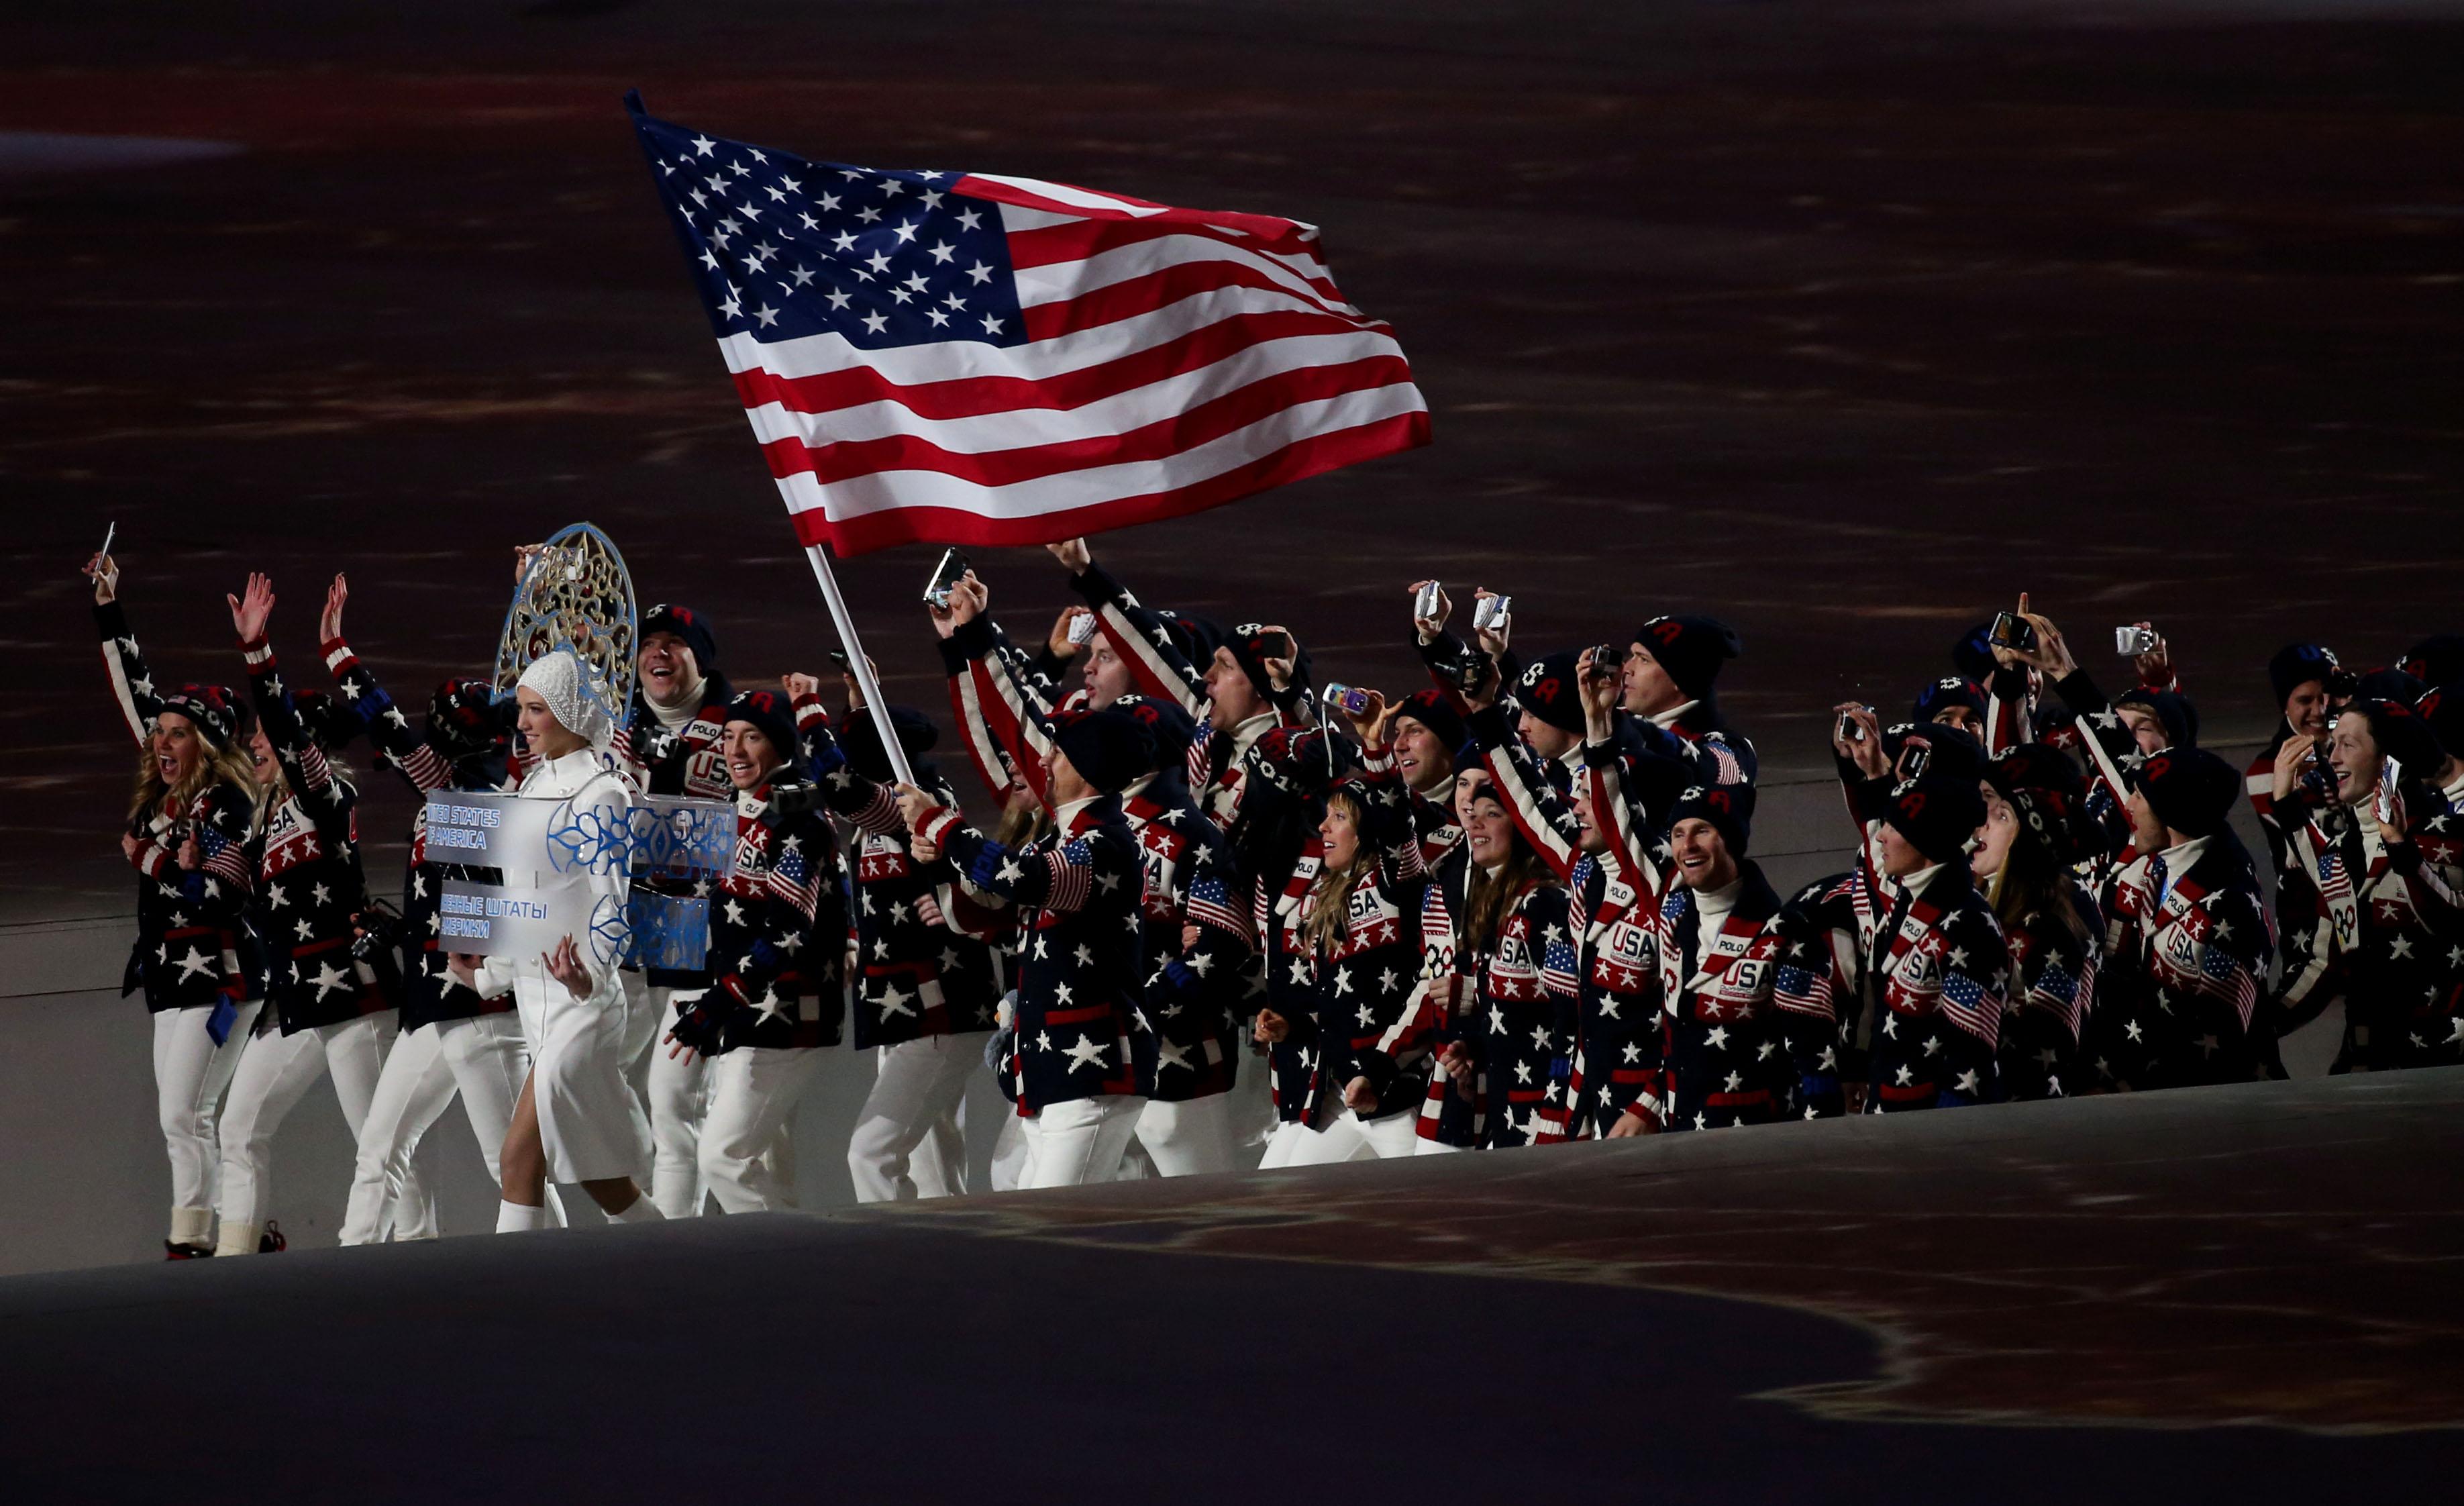 2014 Winter Olympics Opening Ceremony